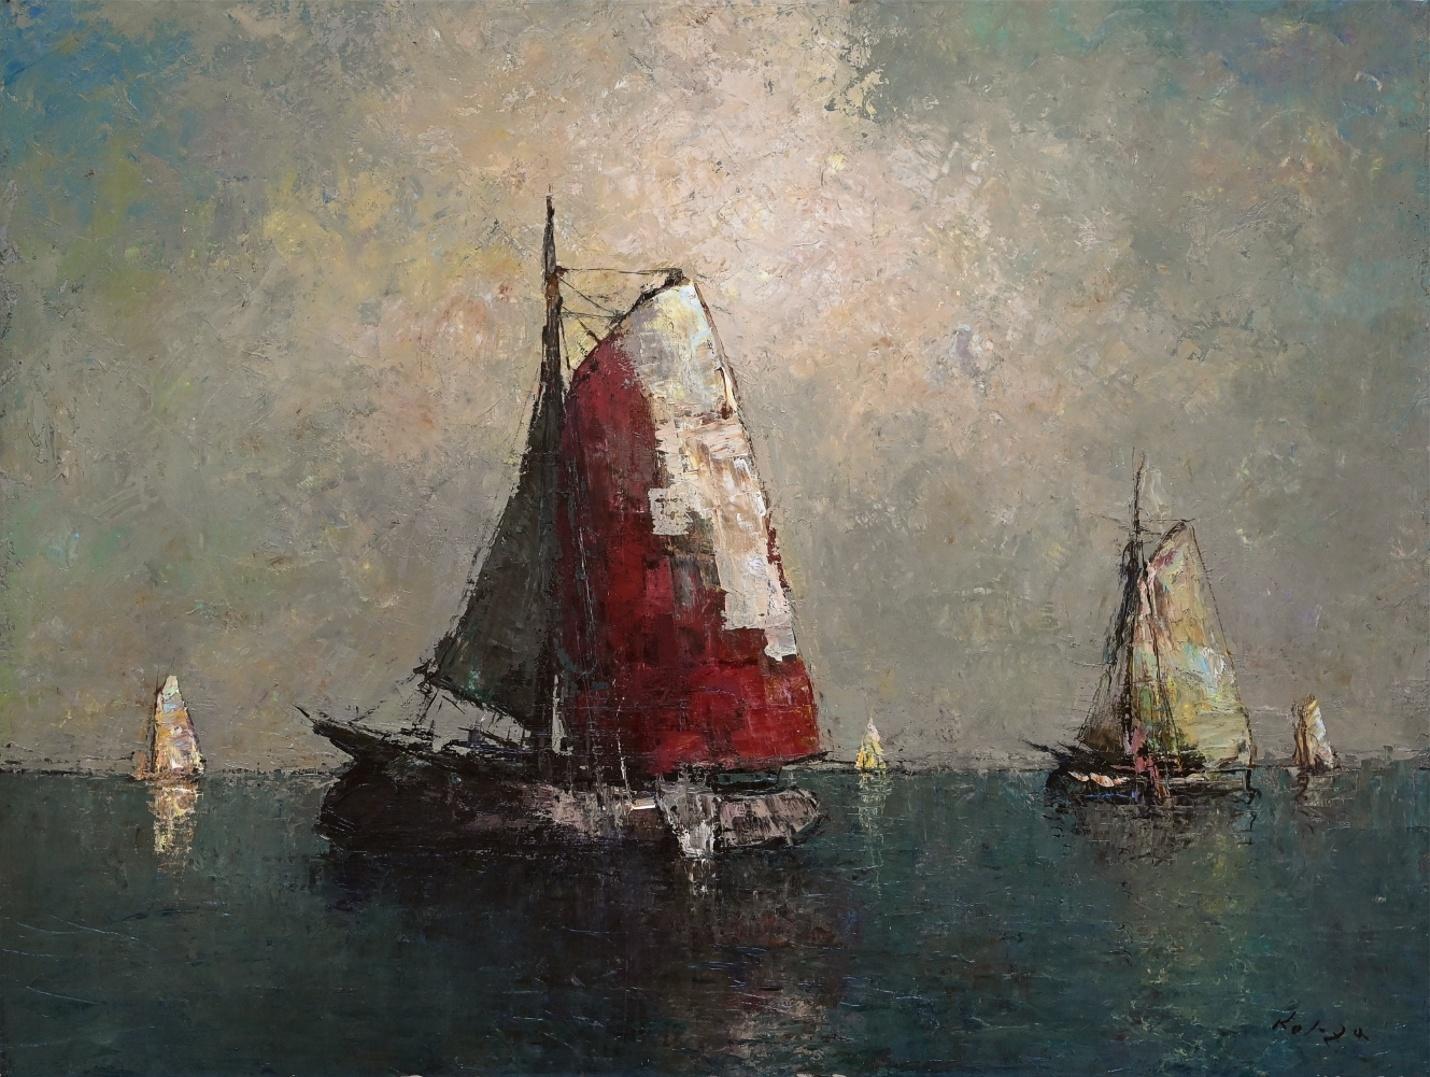 Helmut Kaluza (1912 - 1984) » Öl-Gemälde Spätimpressionismus Italien Meer italienische Küstenlandschaft